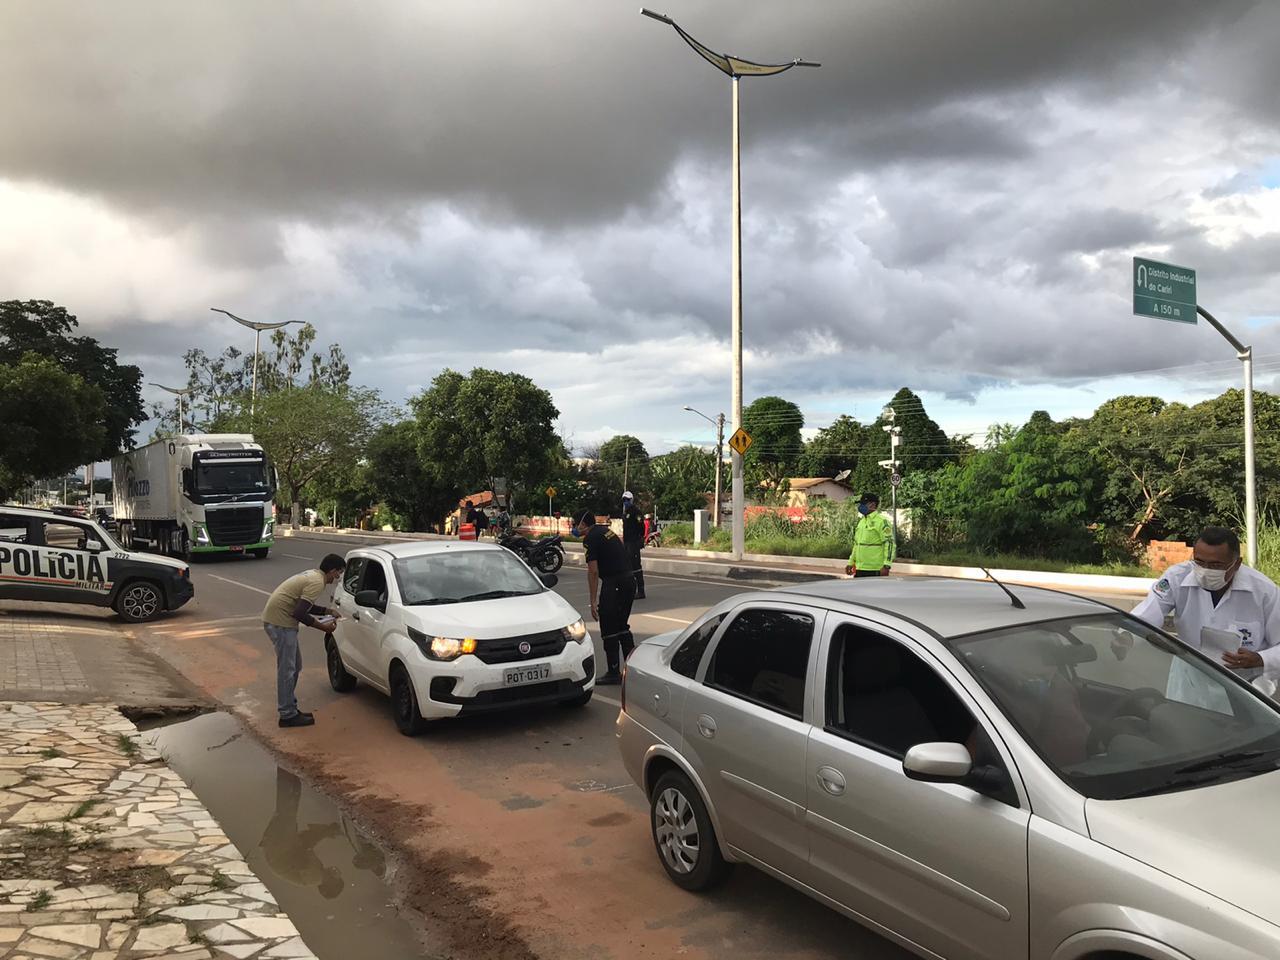 Barbalha realiza barreira sanitária entre municípios limites (2)